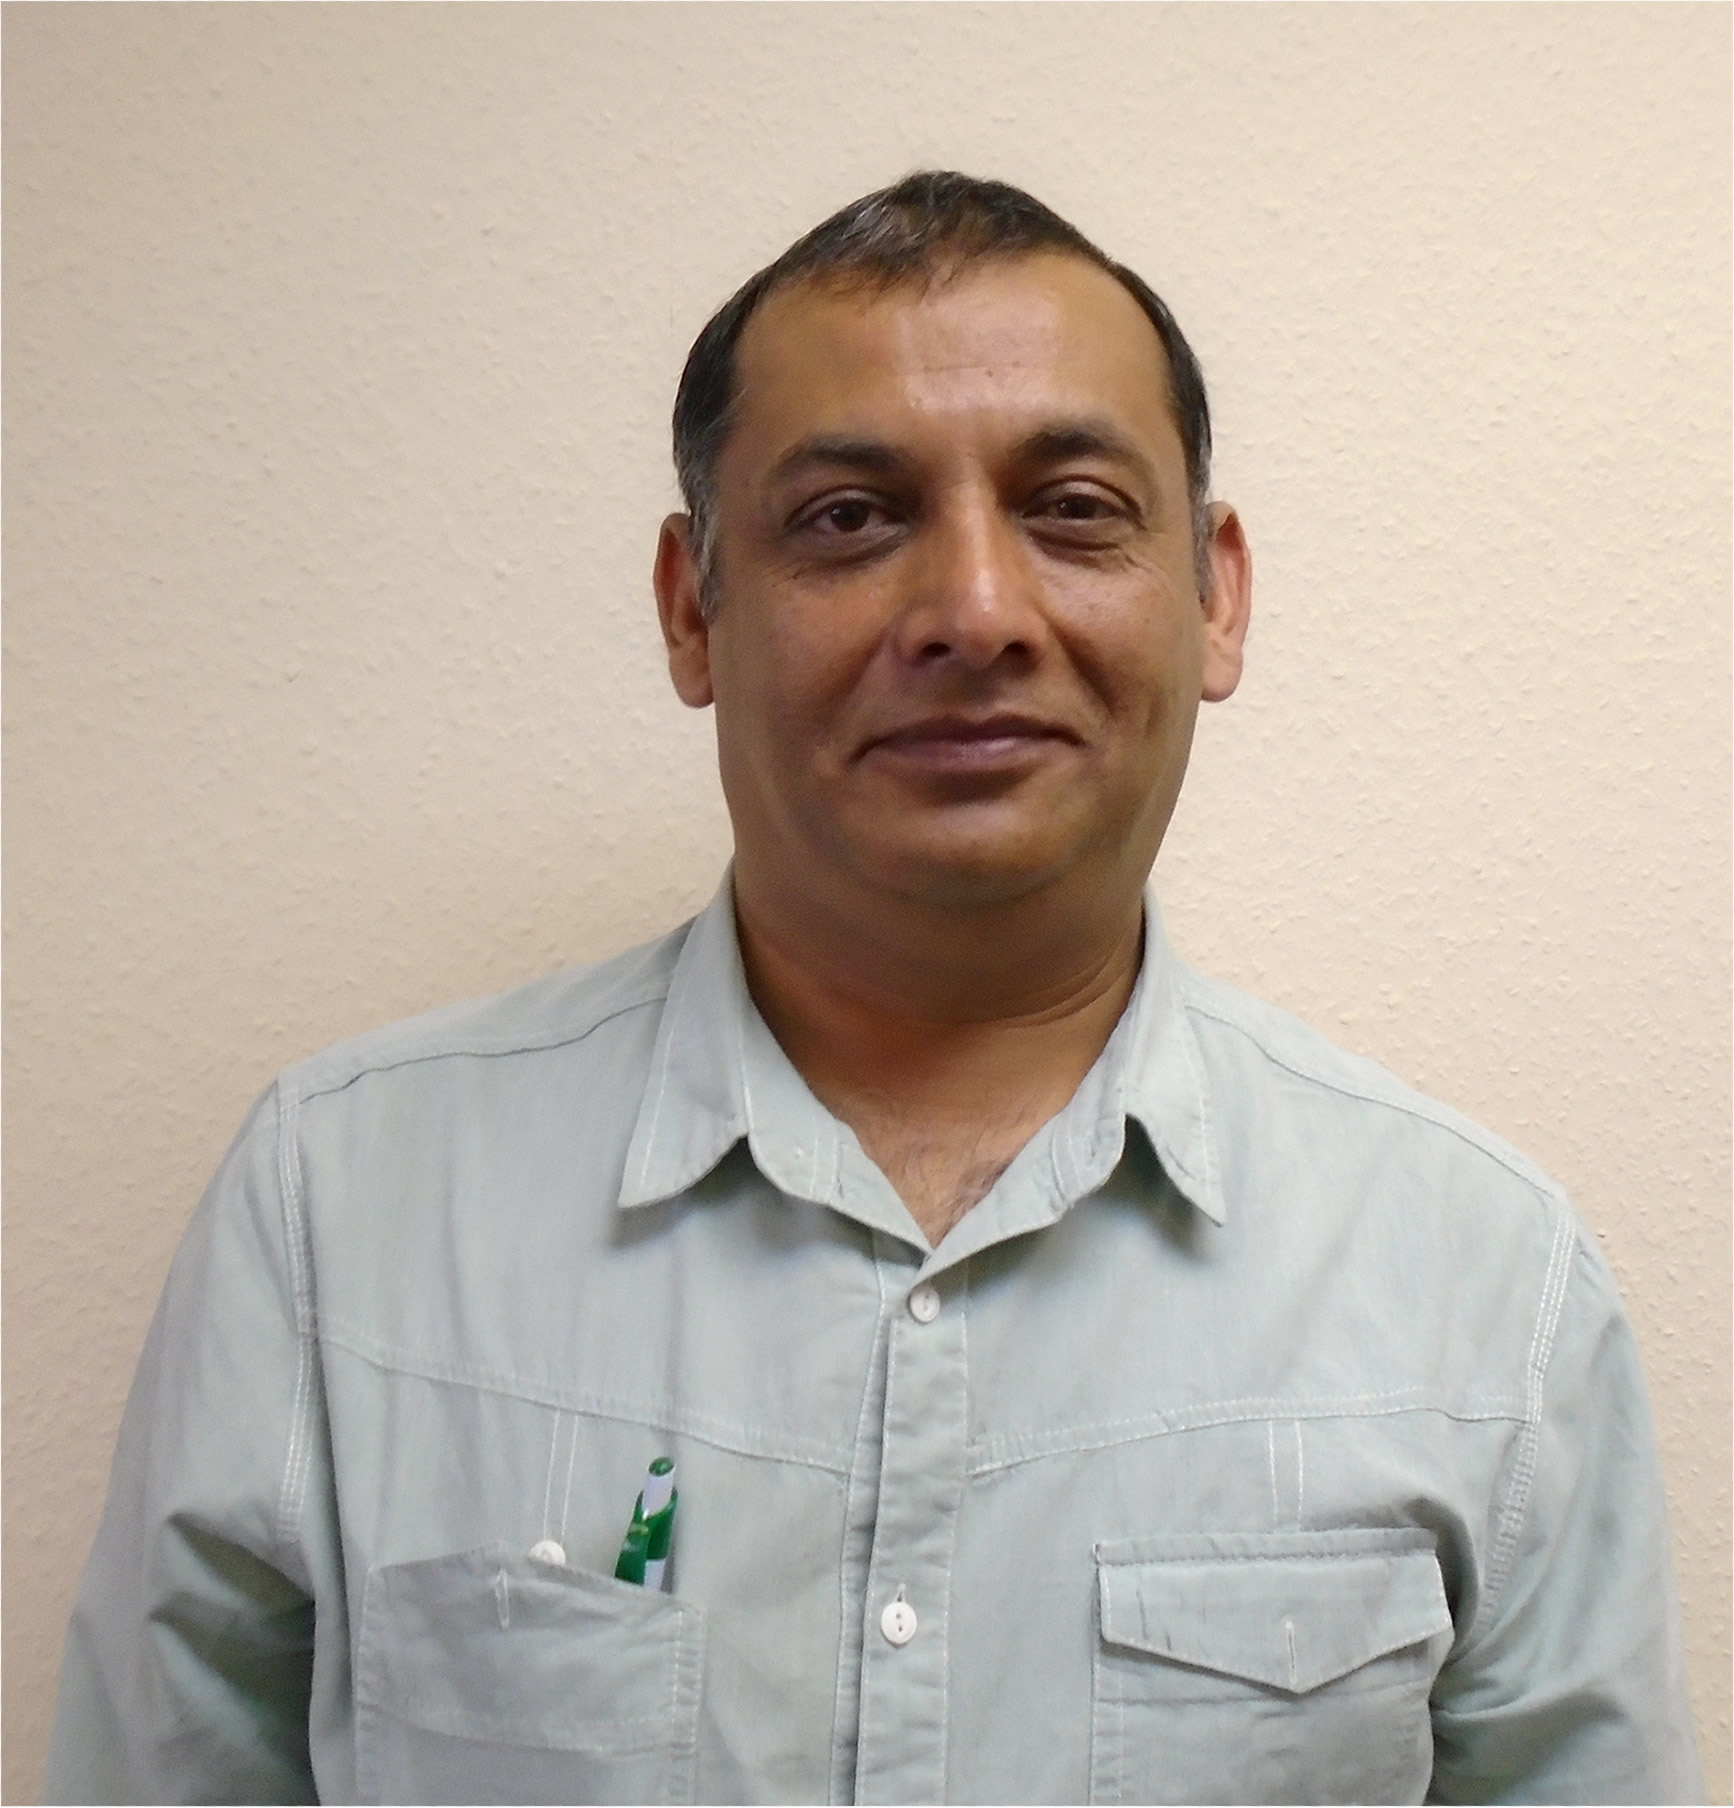 Muhammad Khilji, Birmingham Gas Course